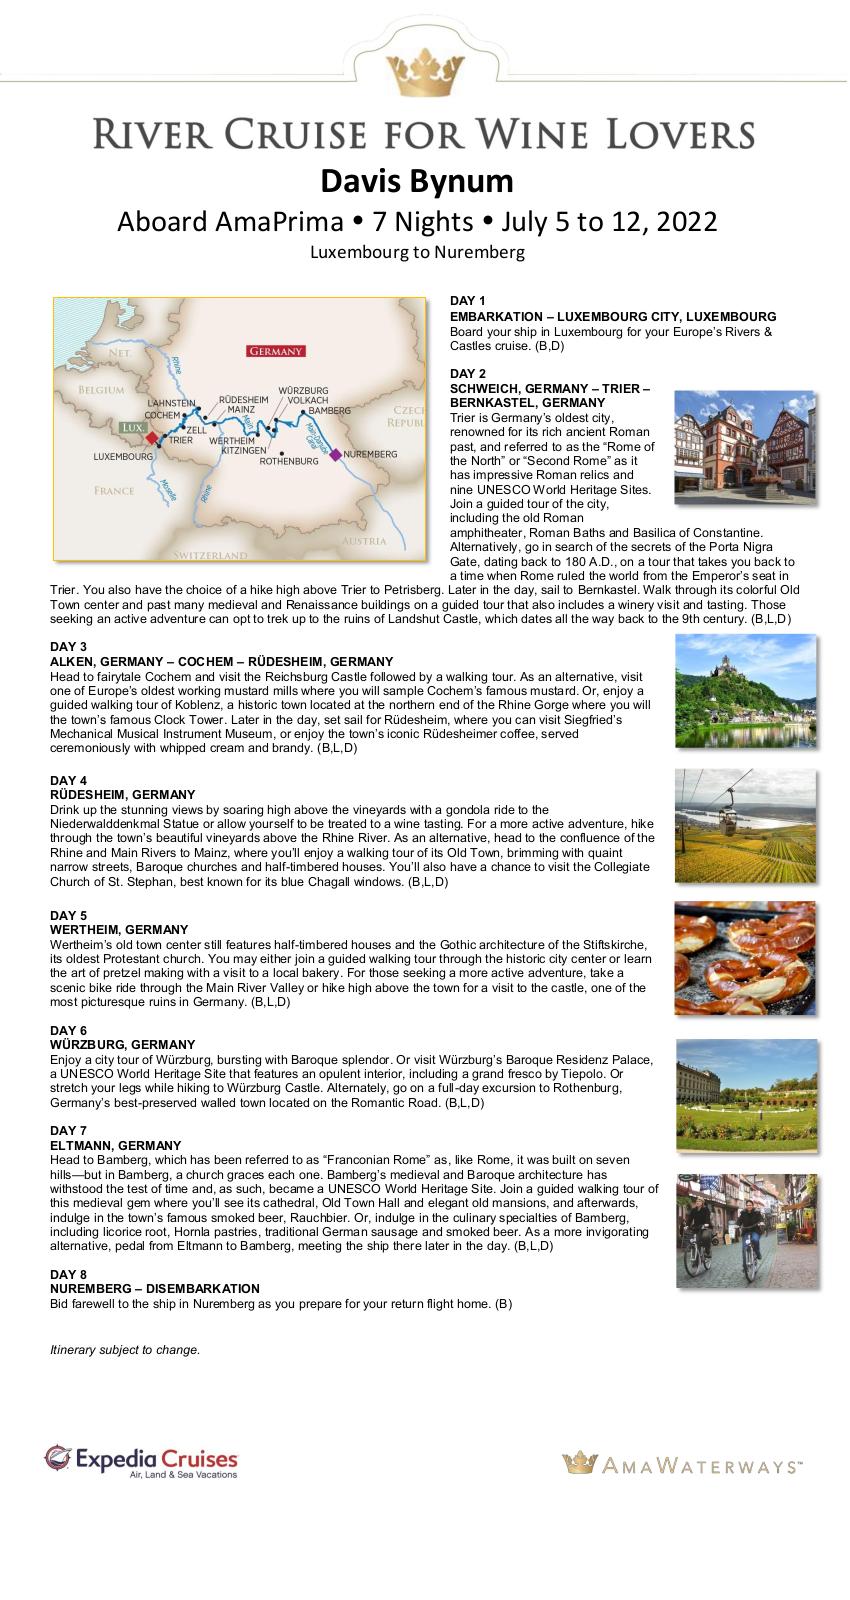 Itinerary - Davis Bynum 2022